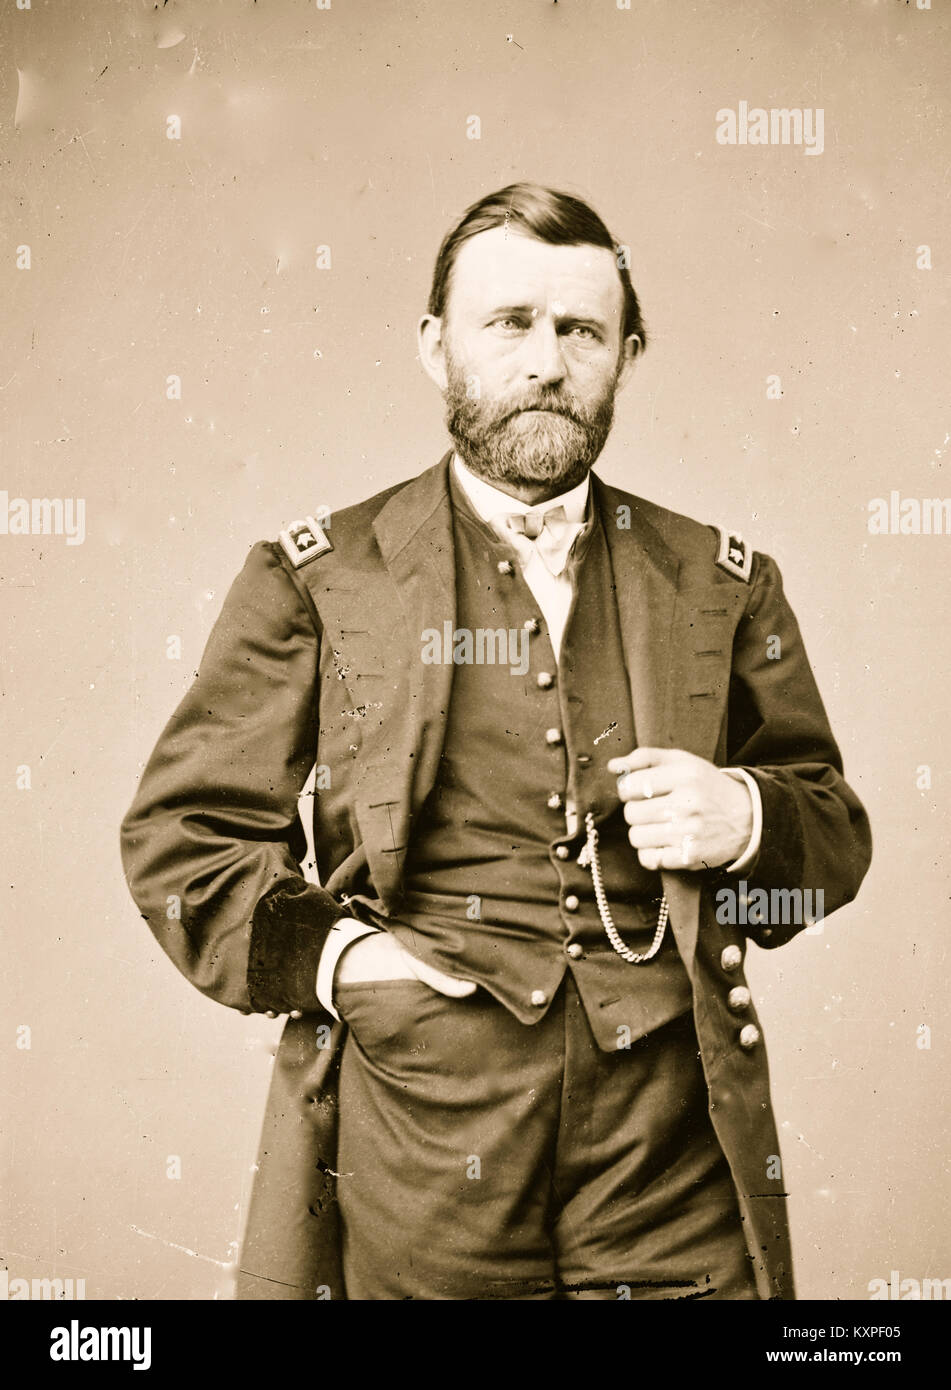 Ulysses S, Grant Portrait - Stock Image